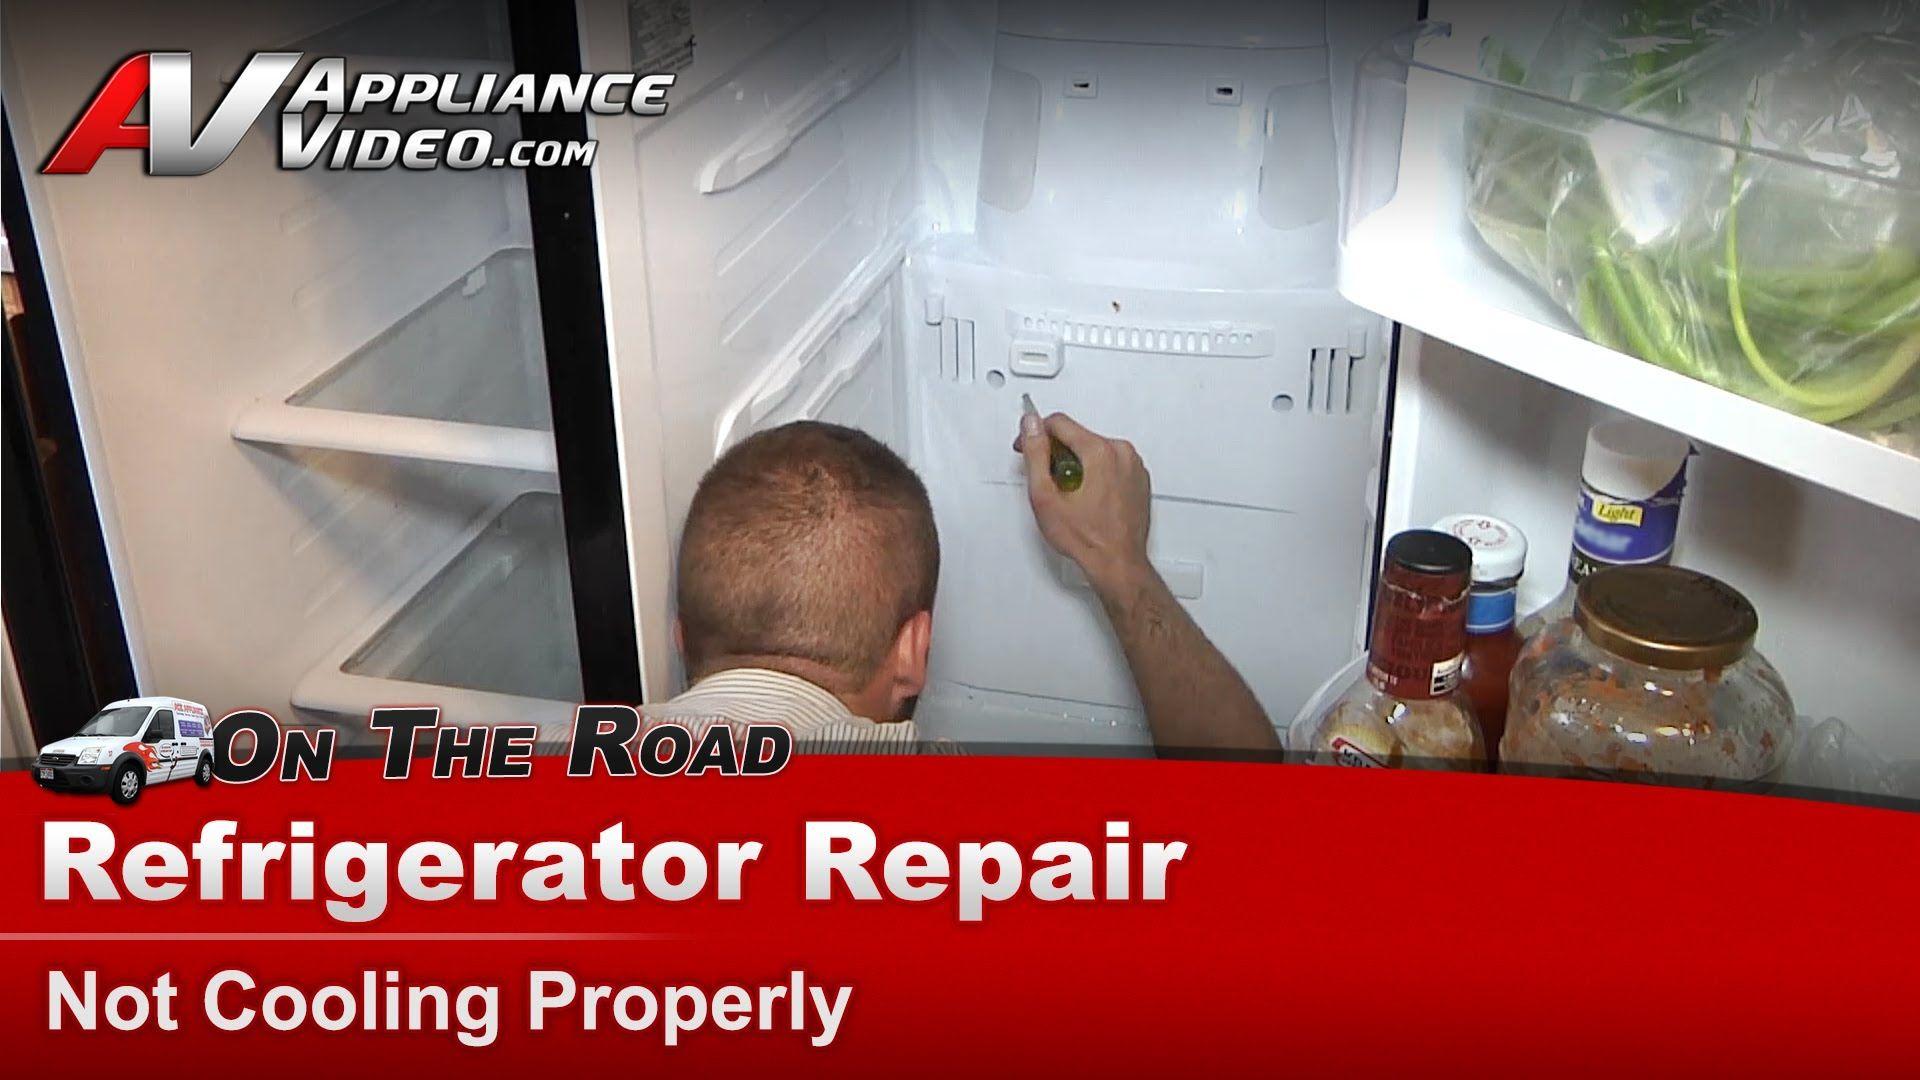 Fix the fridge samsung refrigerator repair not cooling